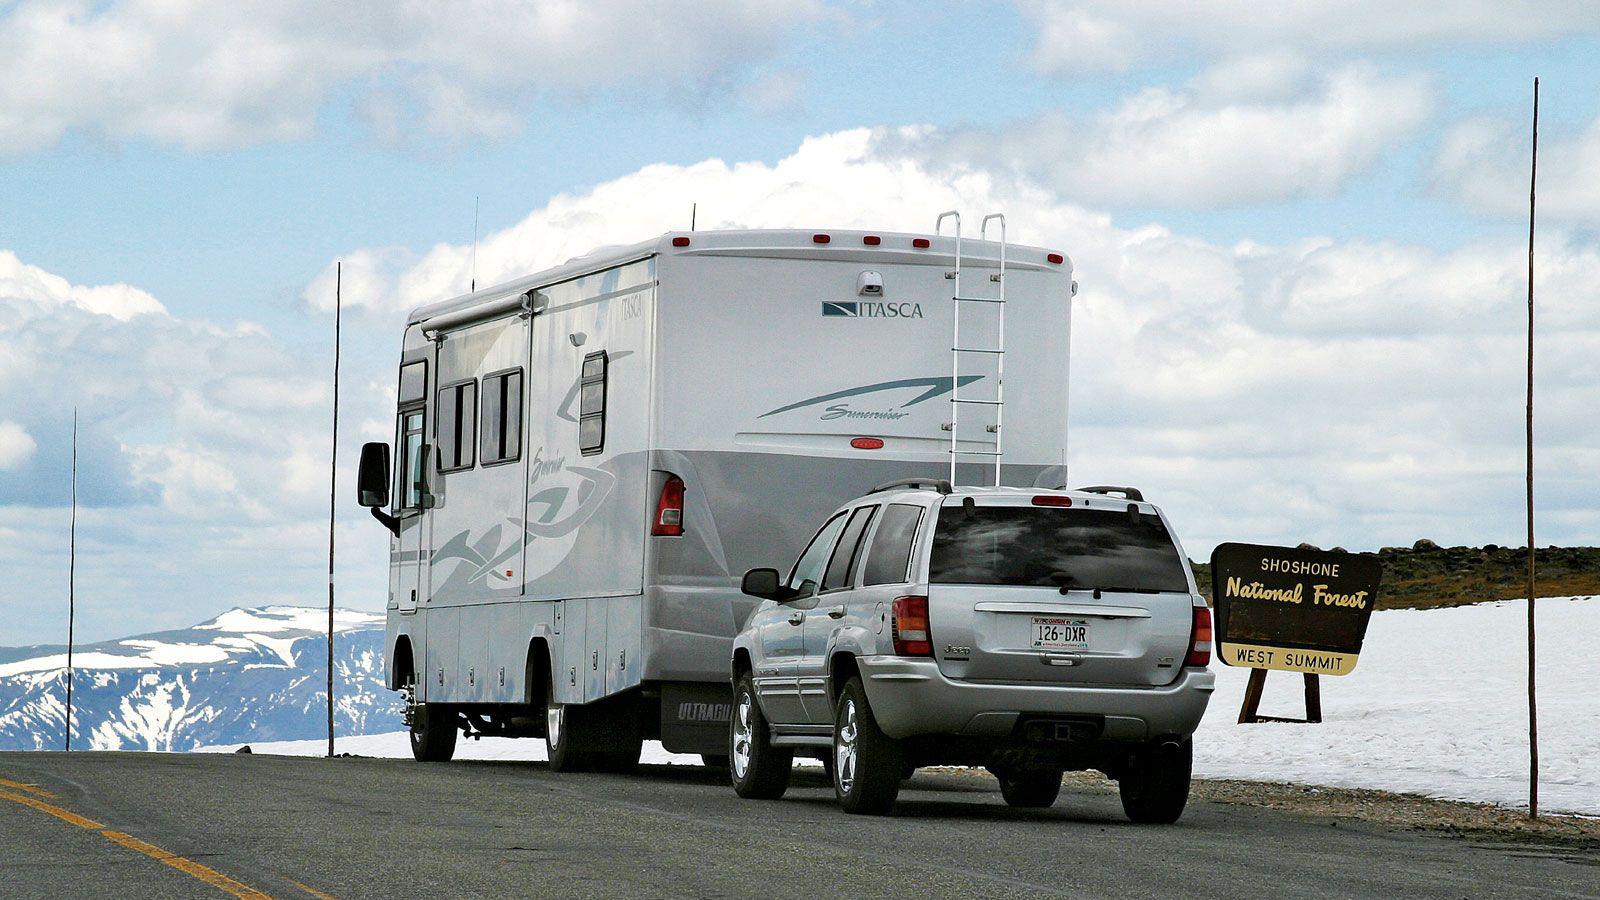 1104rv-01_+rv-towbars-vehicle-flat-towing+motorhome